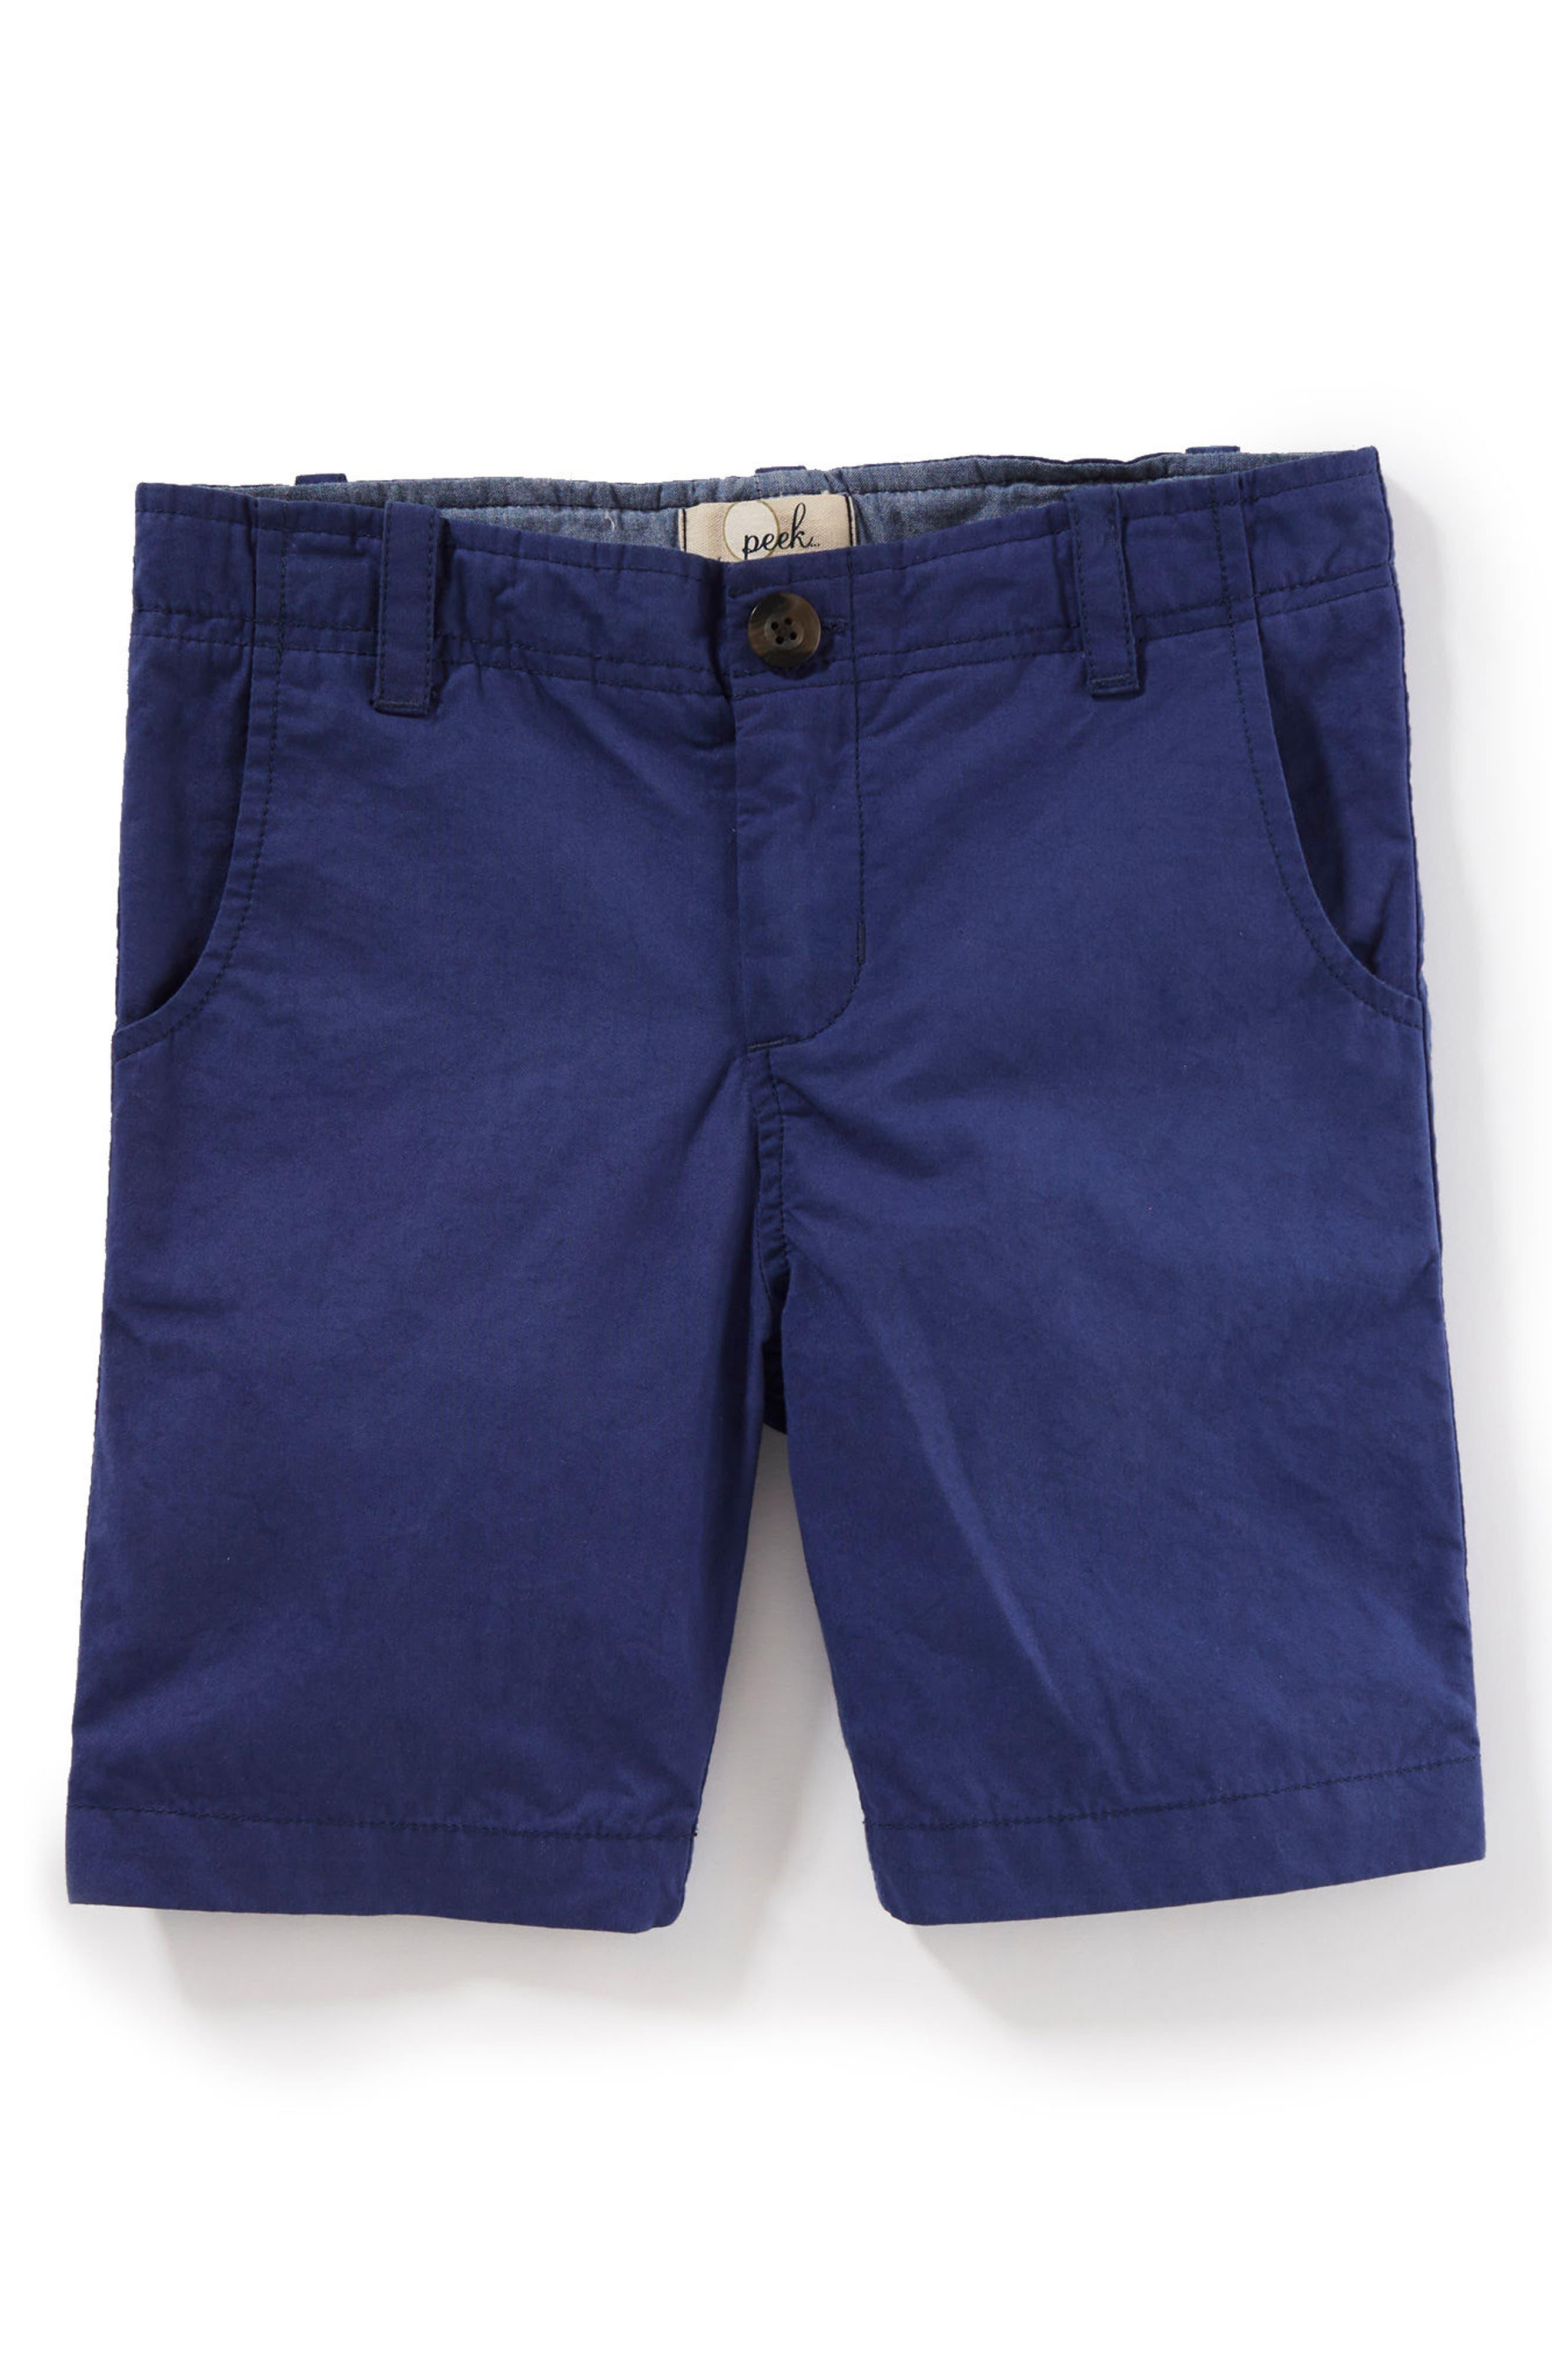 Hudson Shorts,                             Main thumbnail 1, color,                             Blue